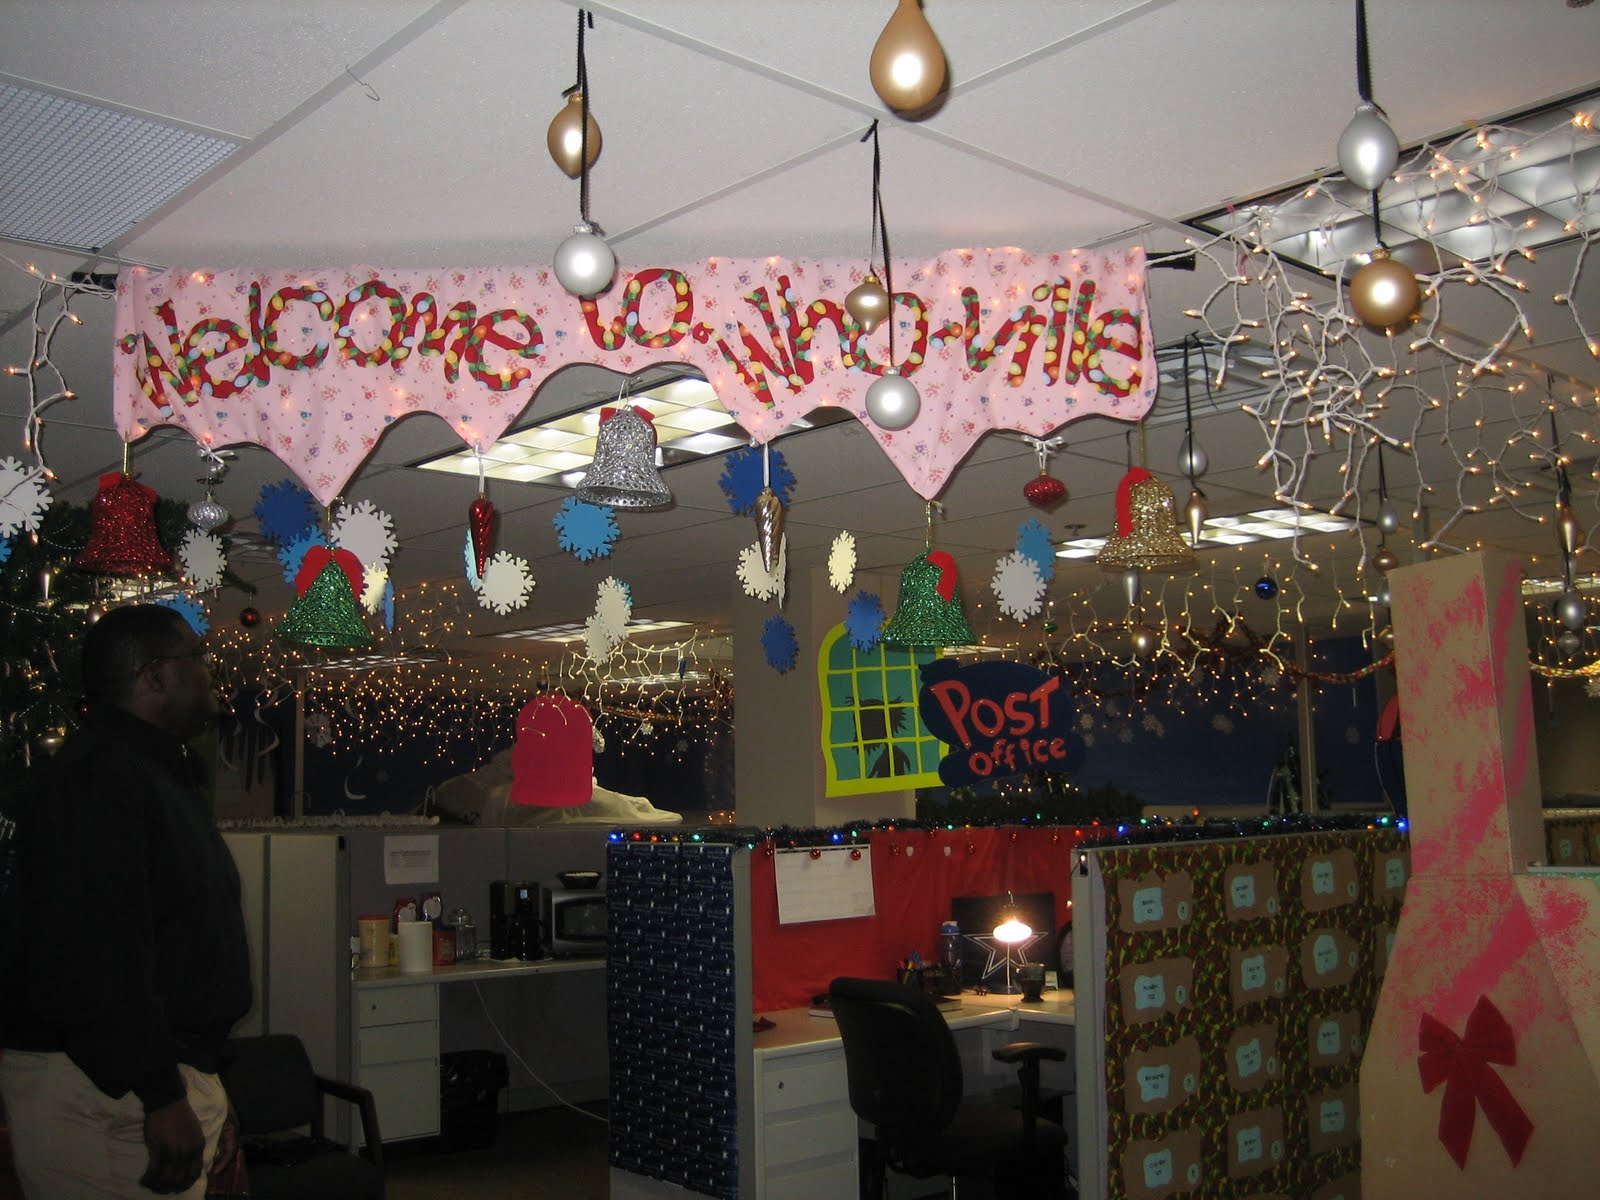 Whoville Office Christmas Decorations 1600x1200 Wallpaper Teahub Io